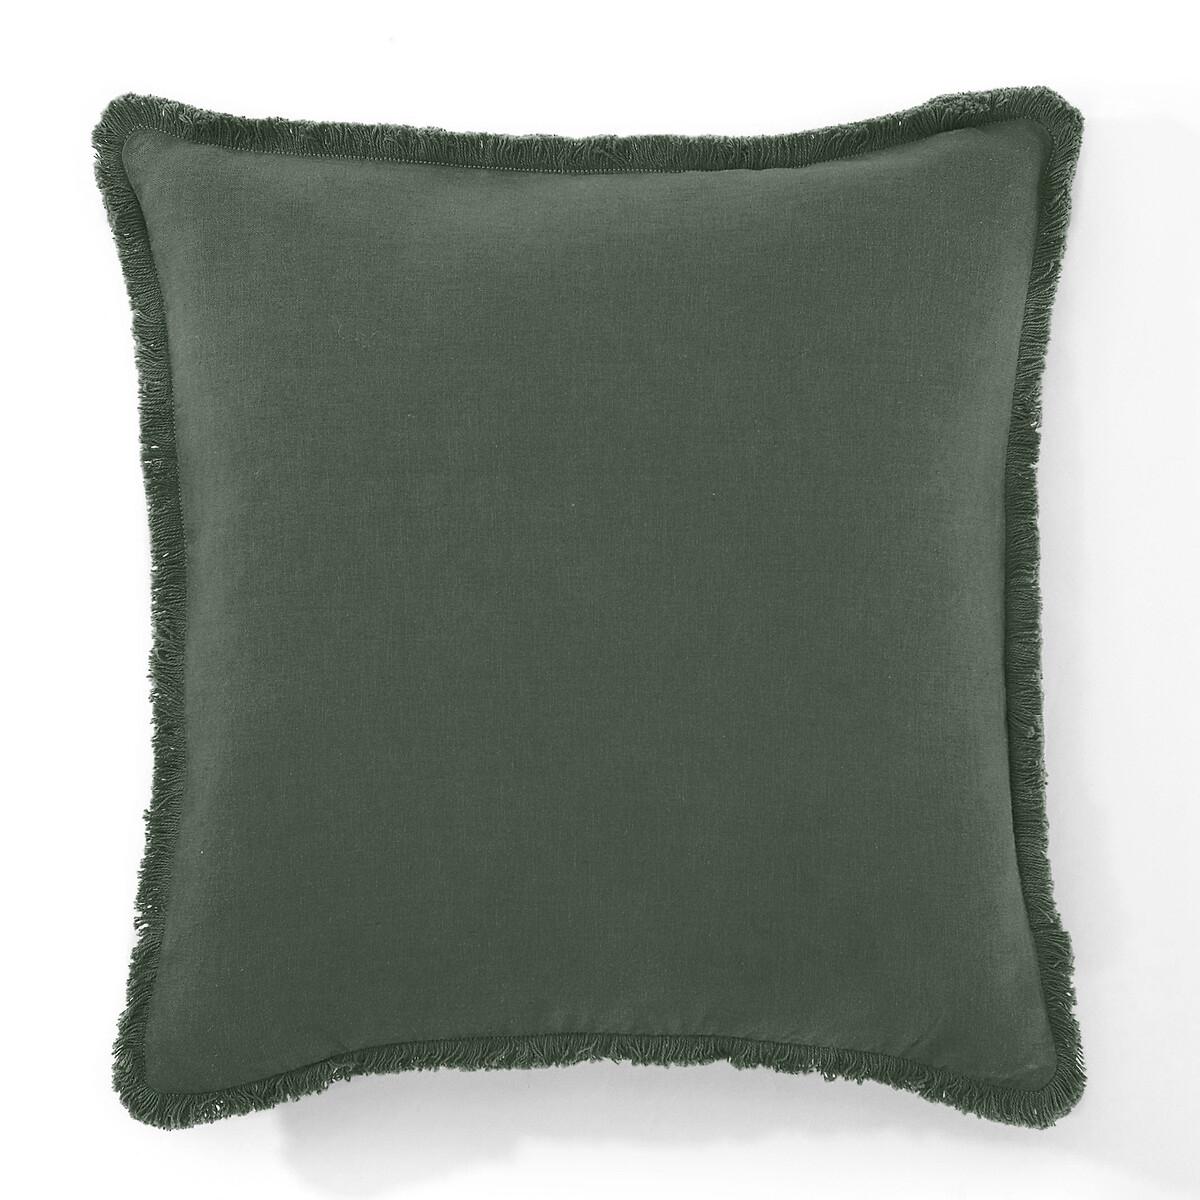 Фото - Чехол LaRedoute На подушку из льнавискозы ODORIE 40 x 40 см зеленый чехол laredoute на подушку валик с отделкой бисером volodia 45 x 45 см зеленый